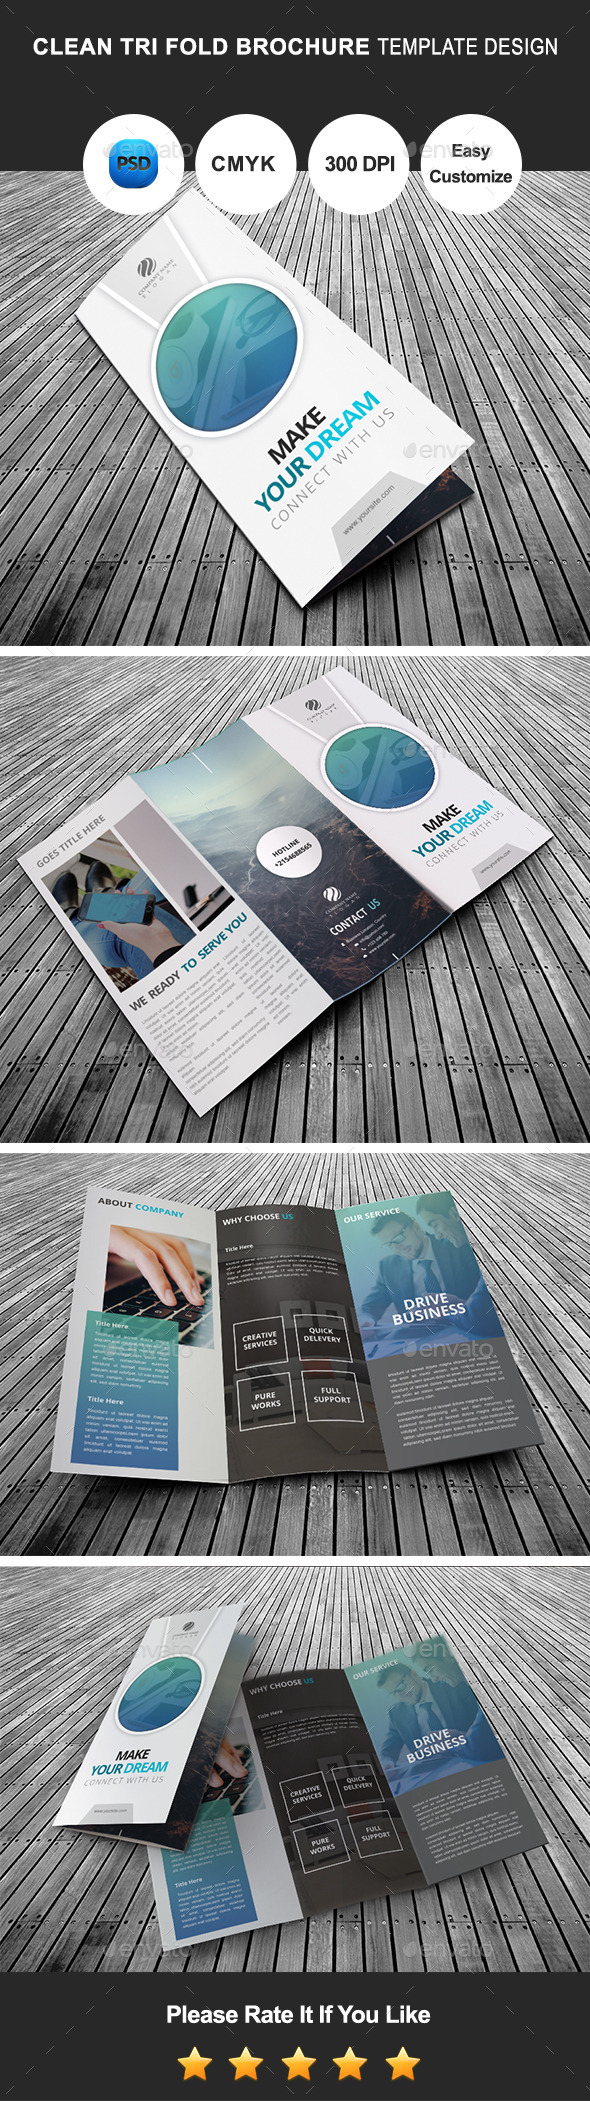 Clean Tri Fold Brochure Template Design - Corporate Brochures